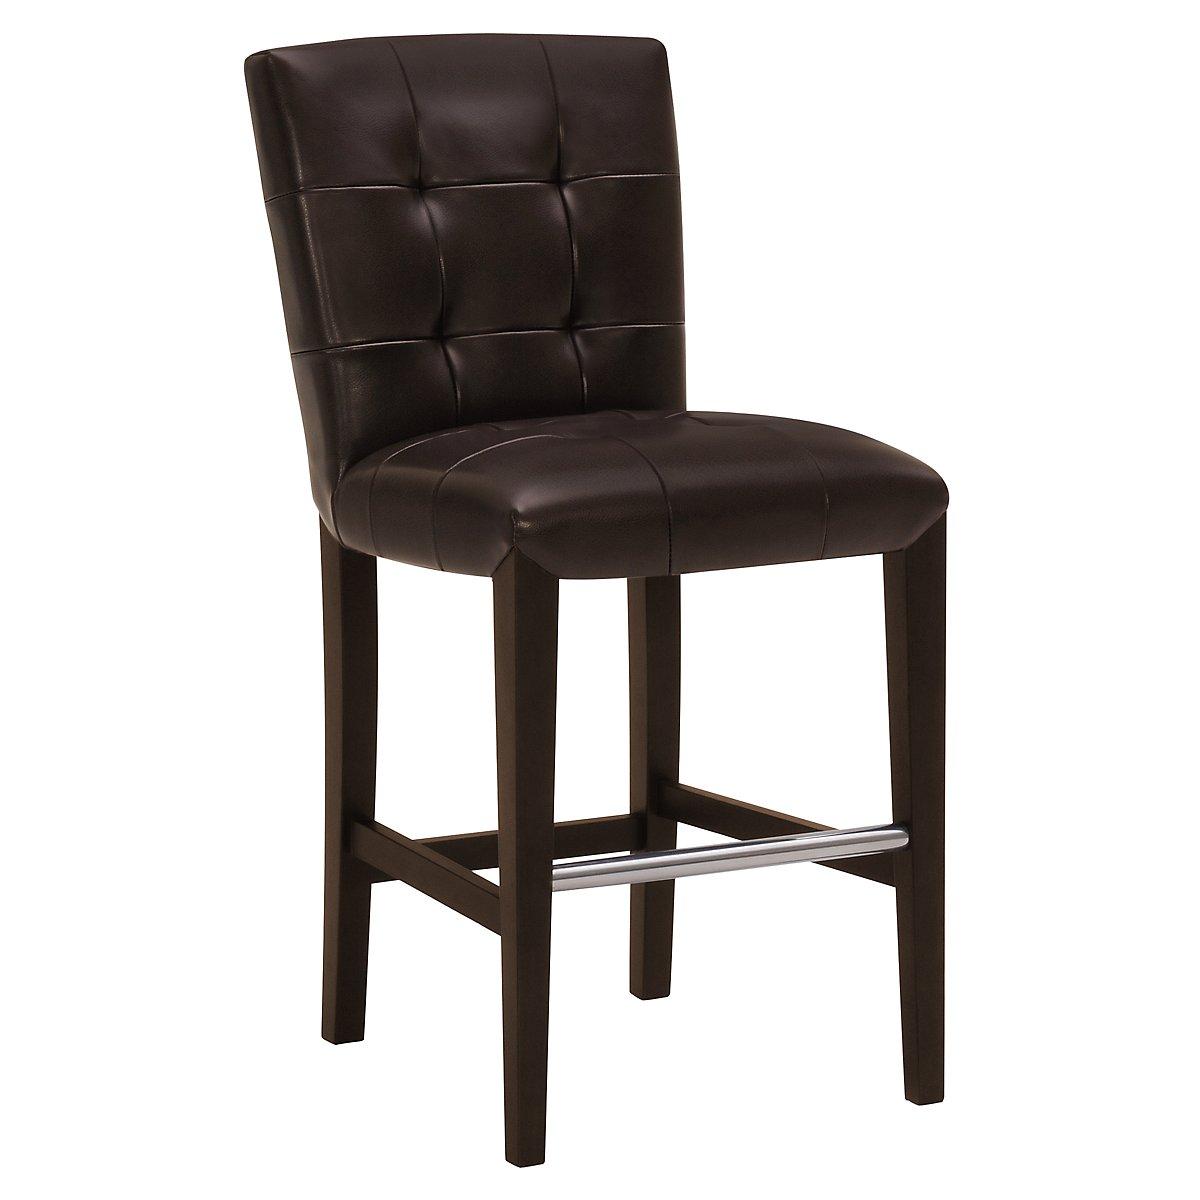 "Trisha Dark Brown Bonded Leather 24"" Upholstered Barstool"